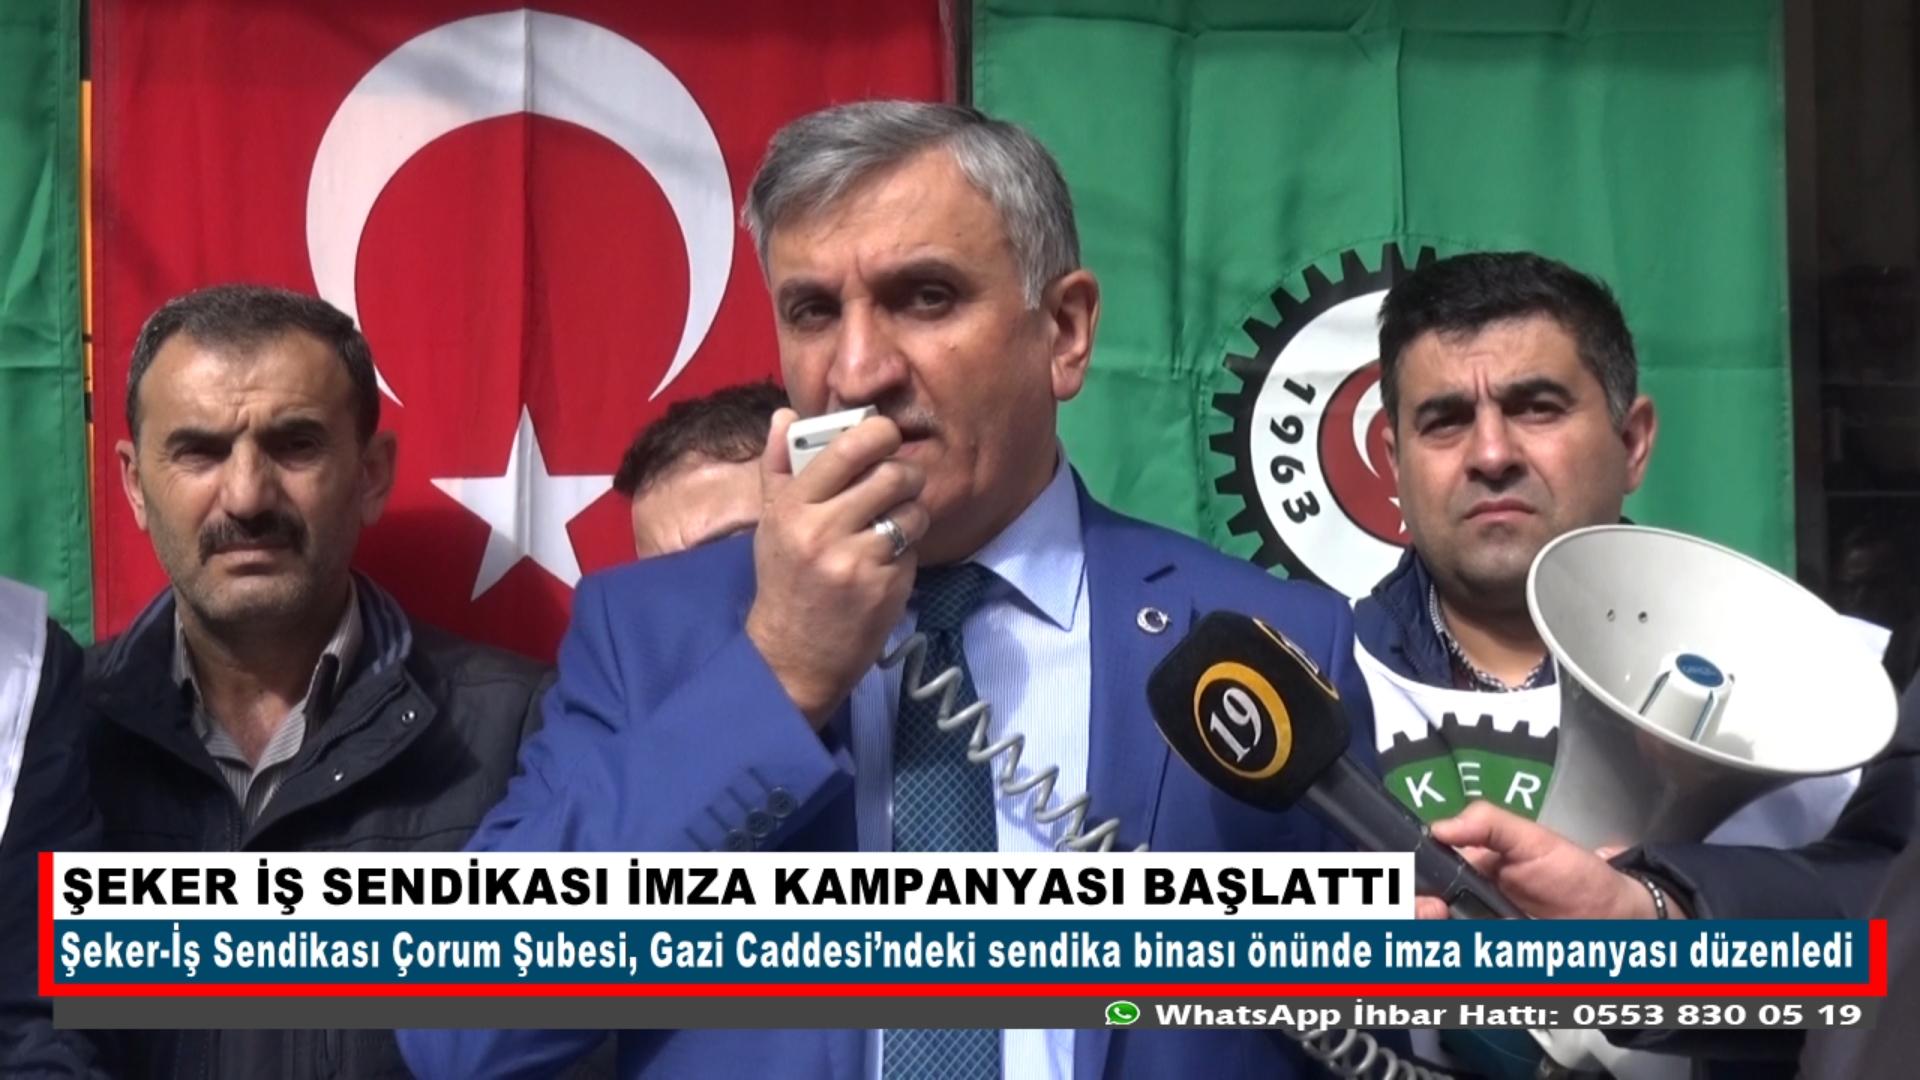 ŞEKER İŞ SENDİKASI İMZA KAMPANYASI BAŞLATTI